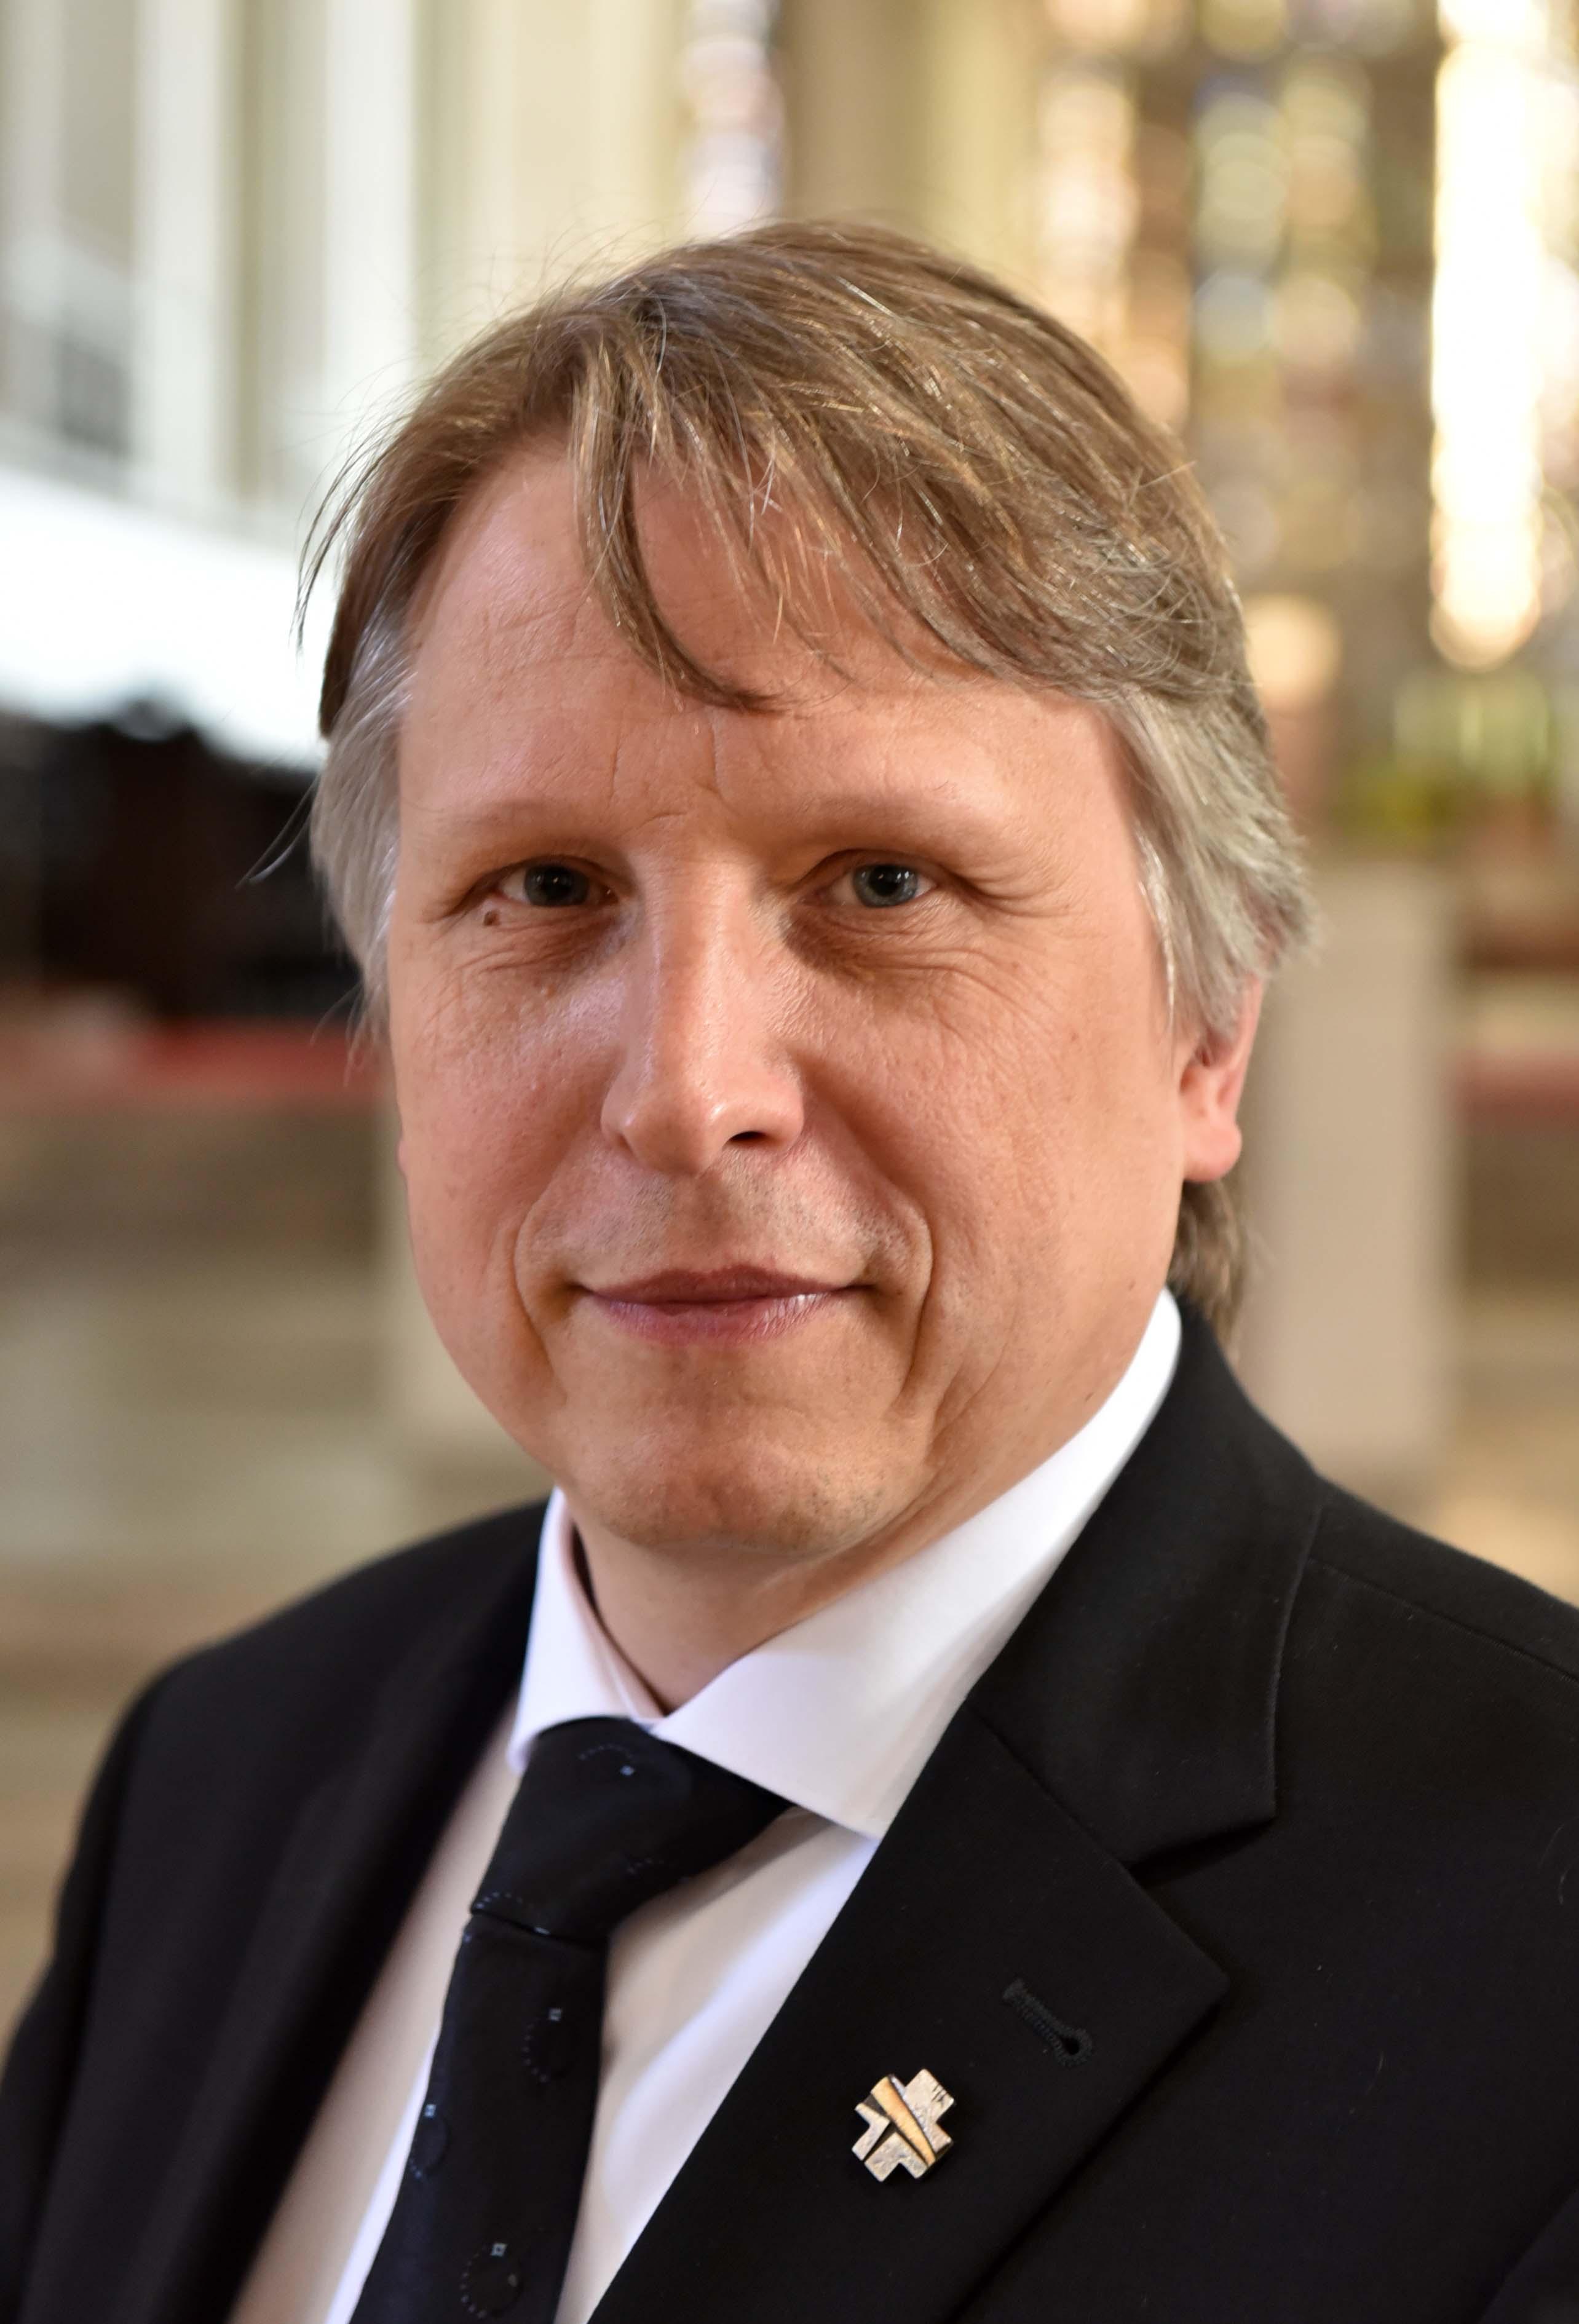 Domkapitular Pfarrer Dr. Thomas Groll (Foto: Nicolas Schnall / pba)